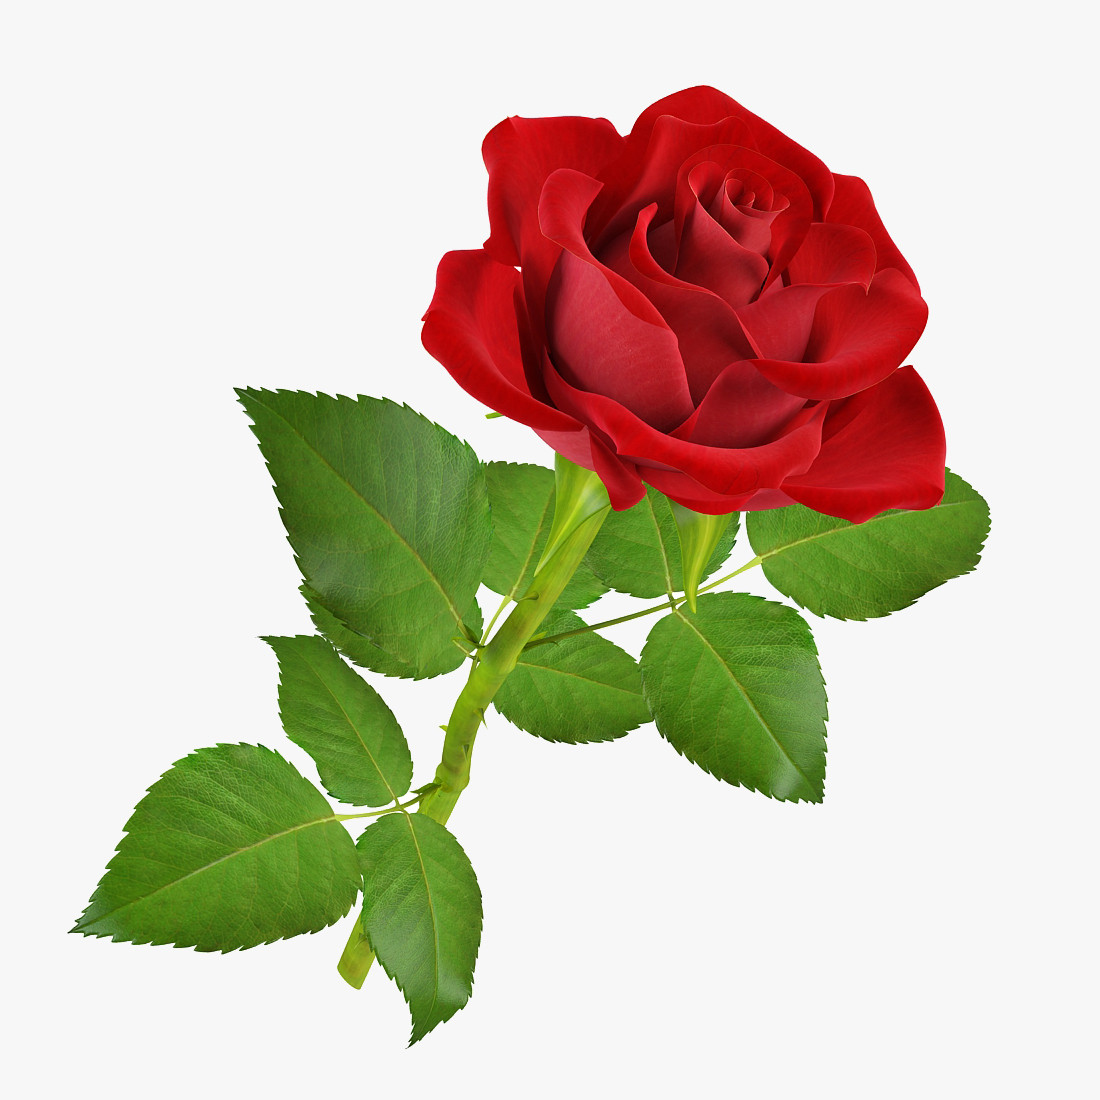 pr_rose5_1_1.jpg